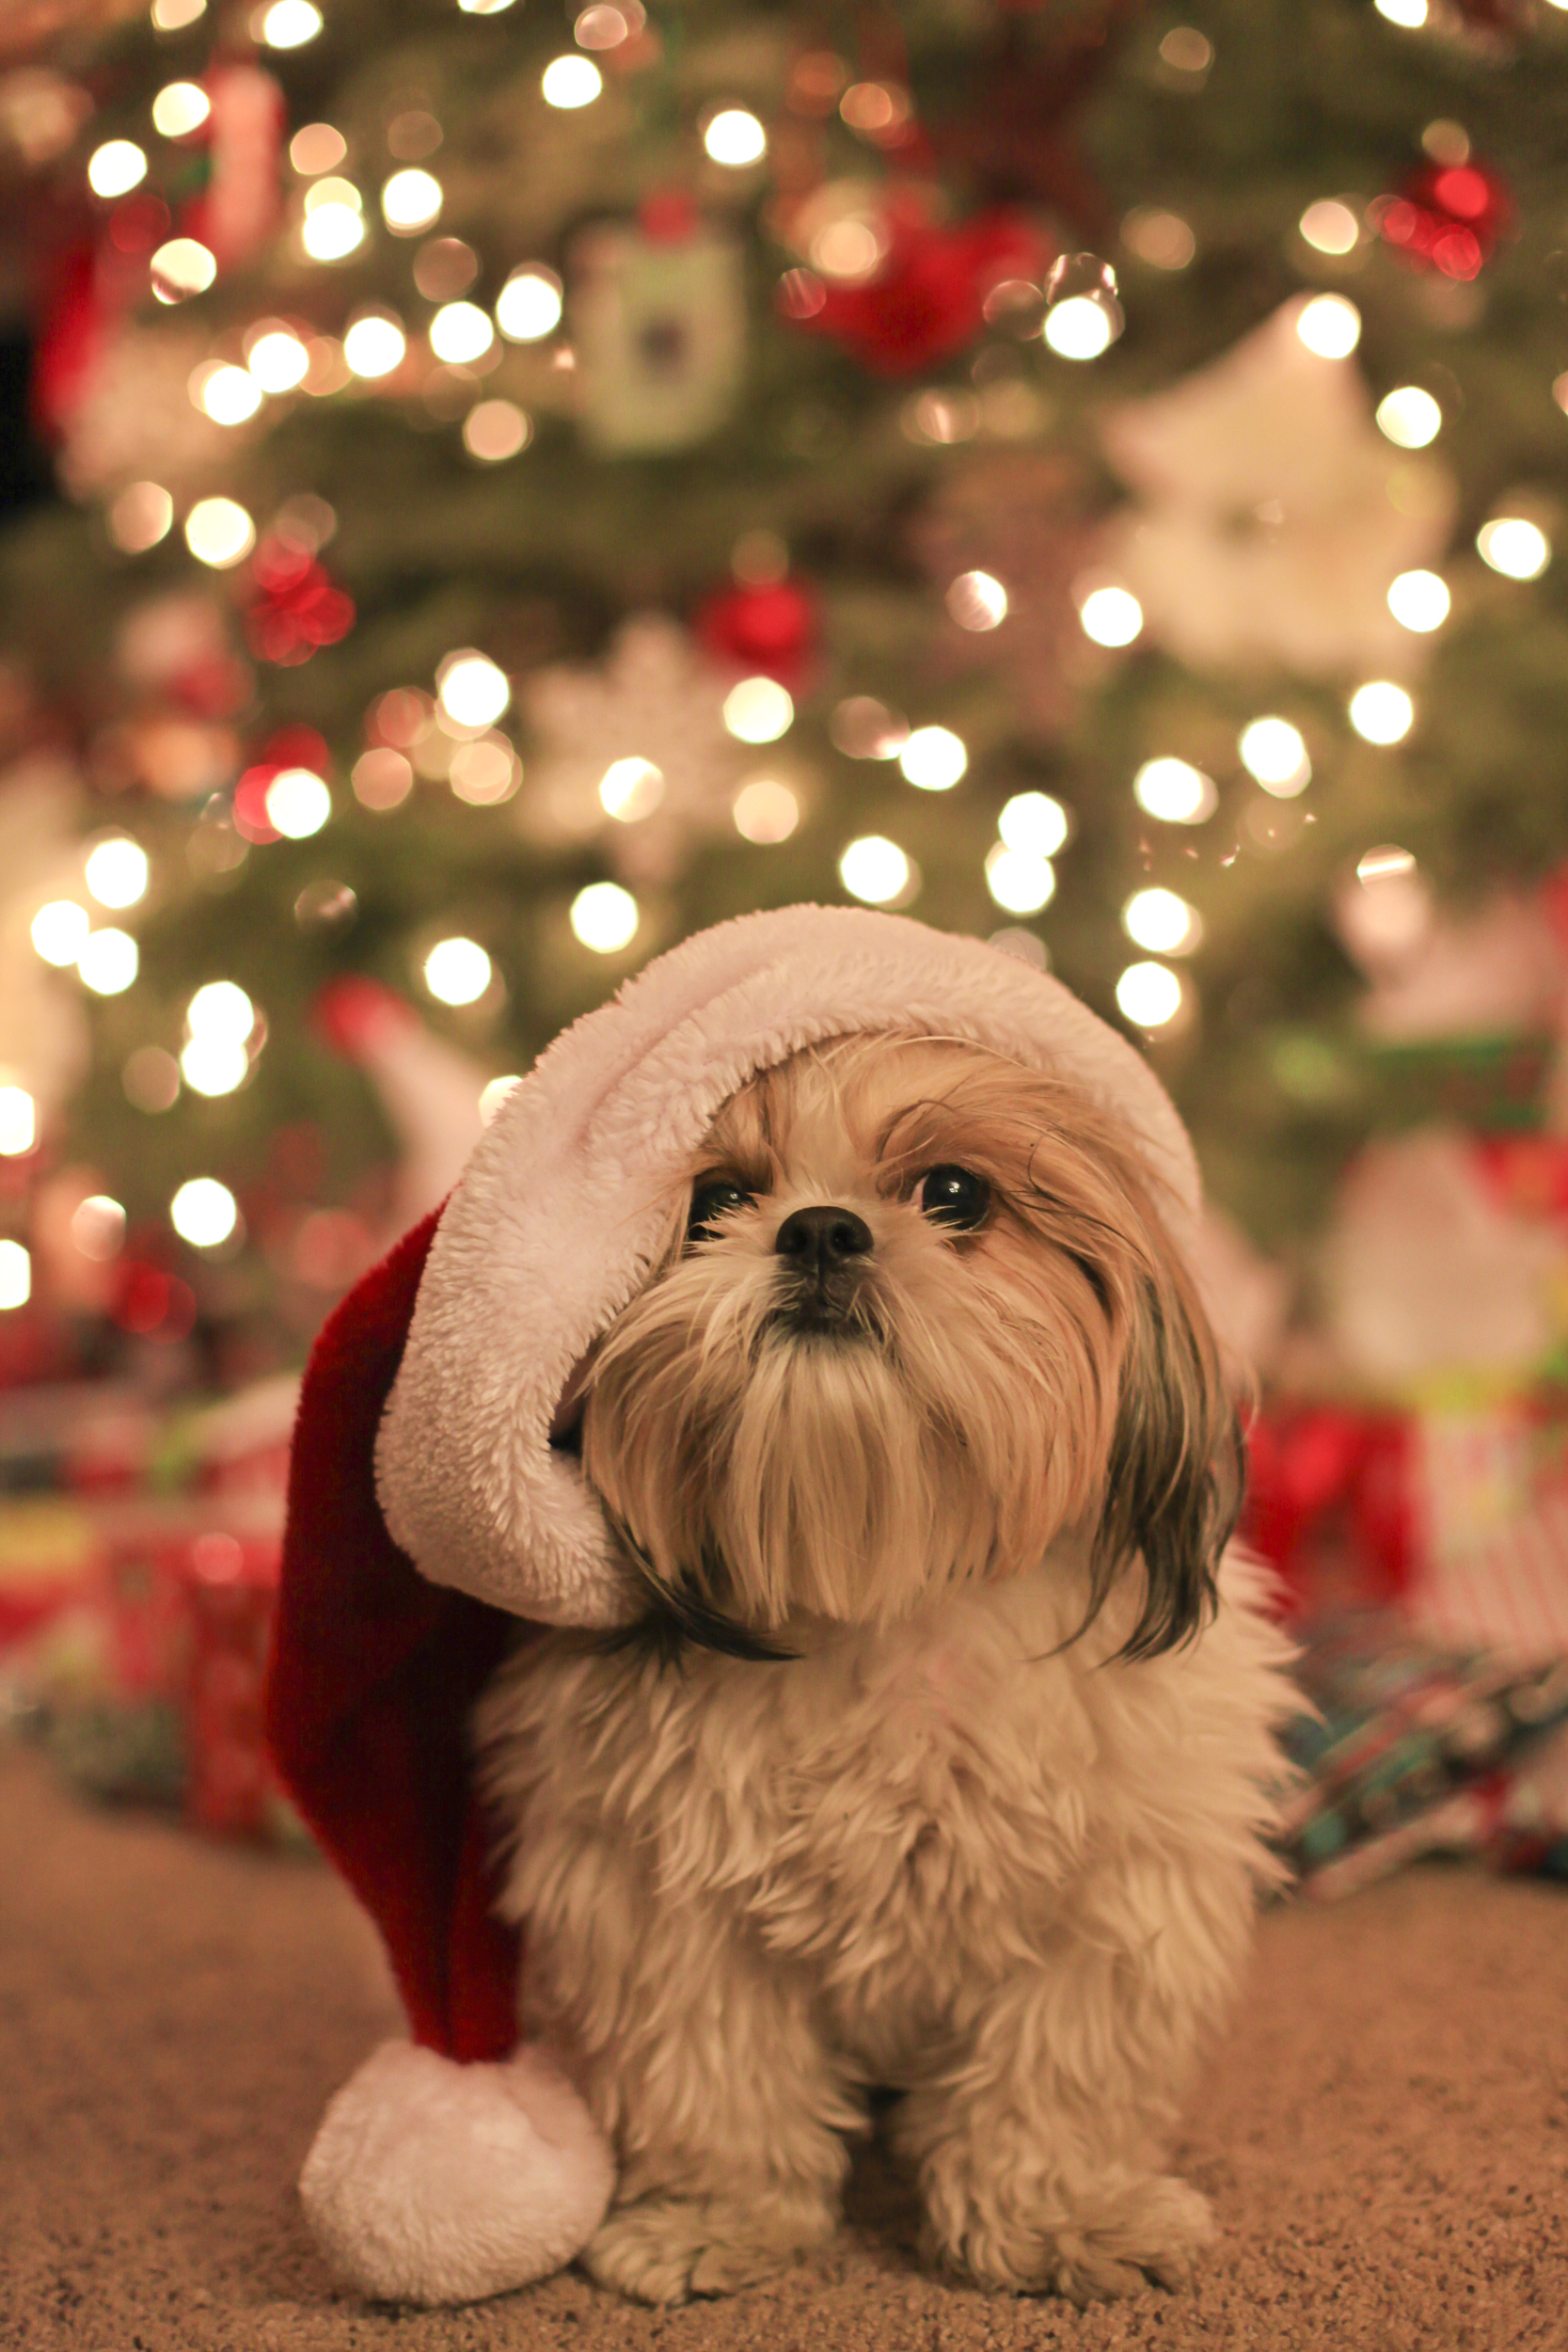 Christmas Eve. December 24, 2015 2665